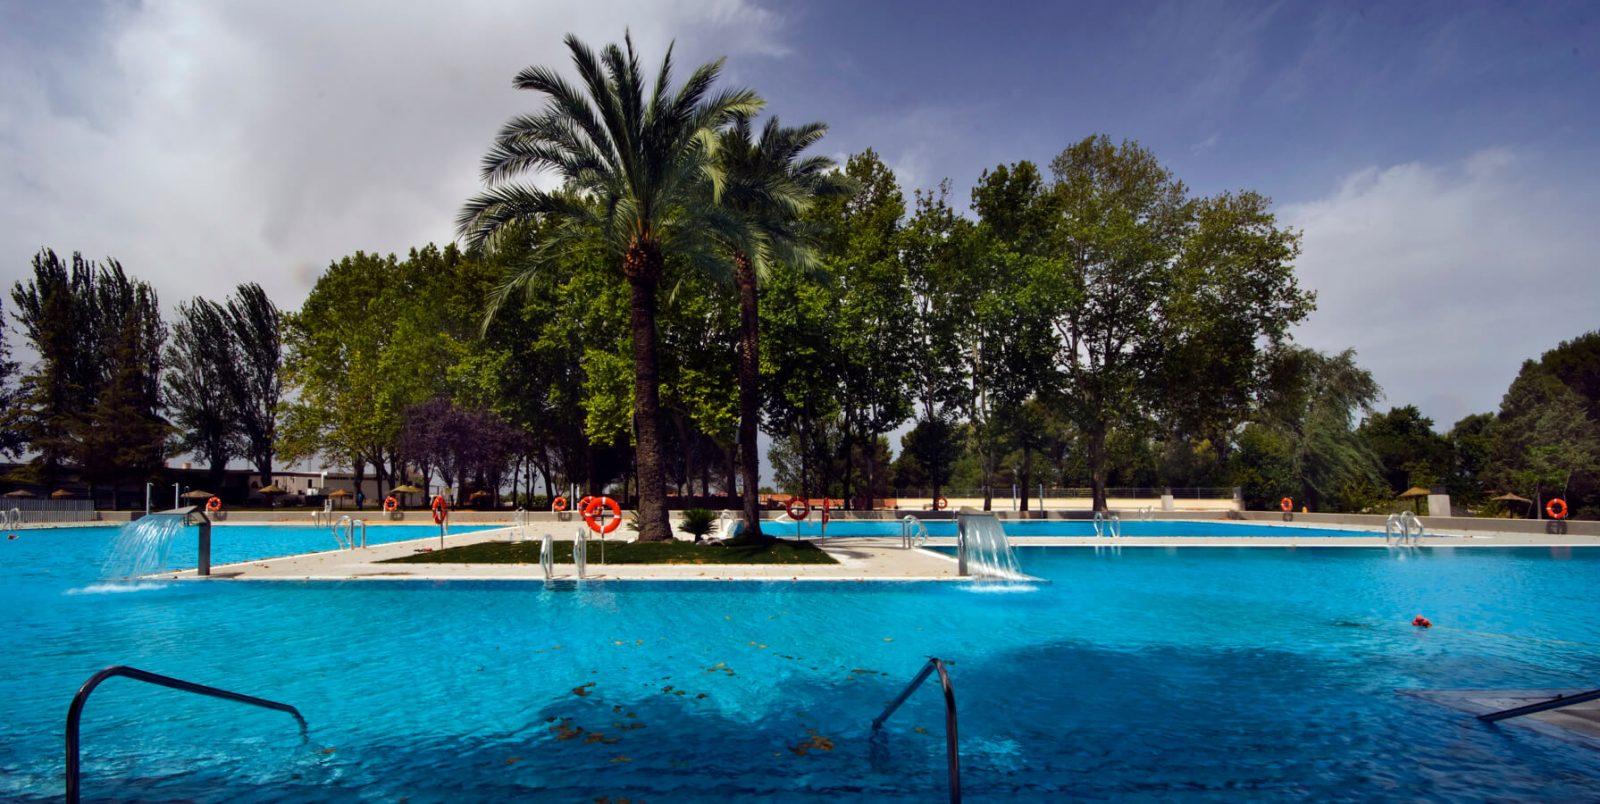 Piscinas municipales de verano de montilla hidroingenia for Piscina municipal fuenlabrada 2017